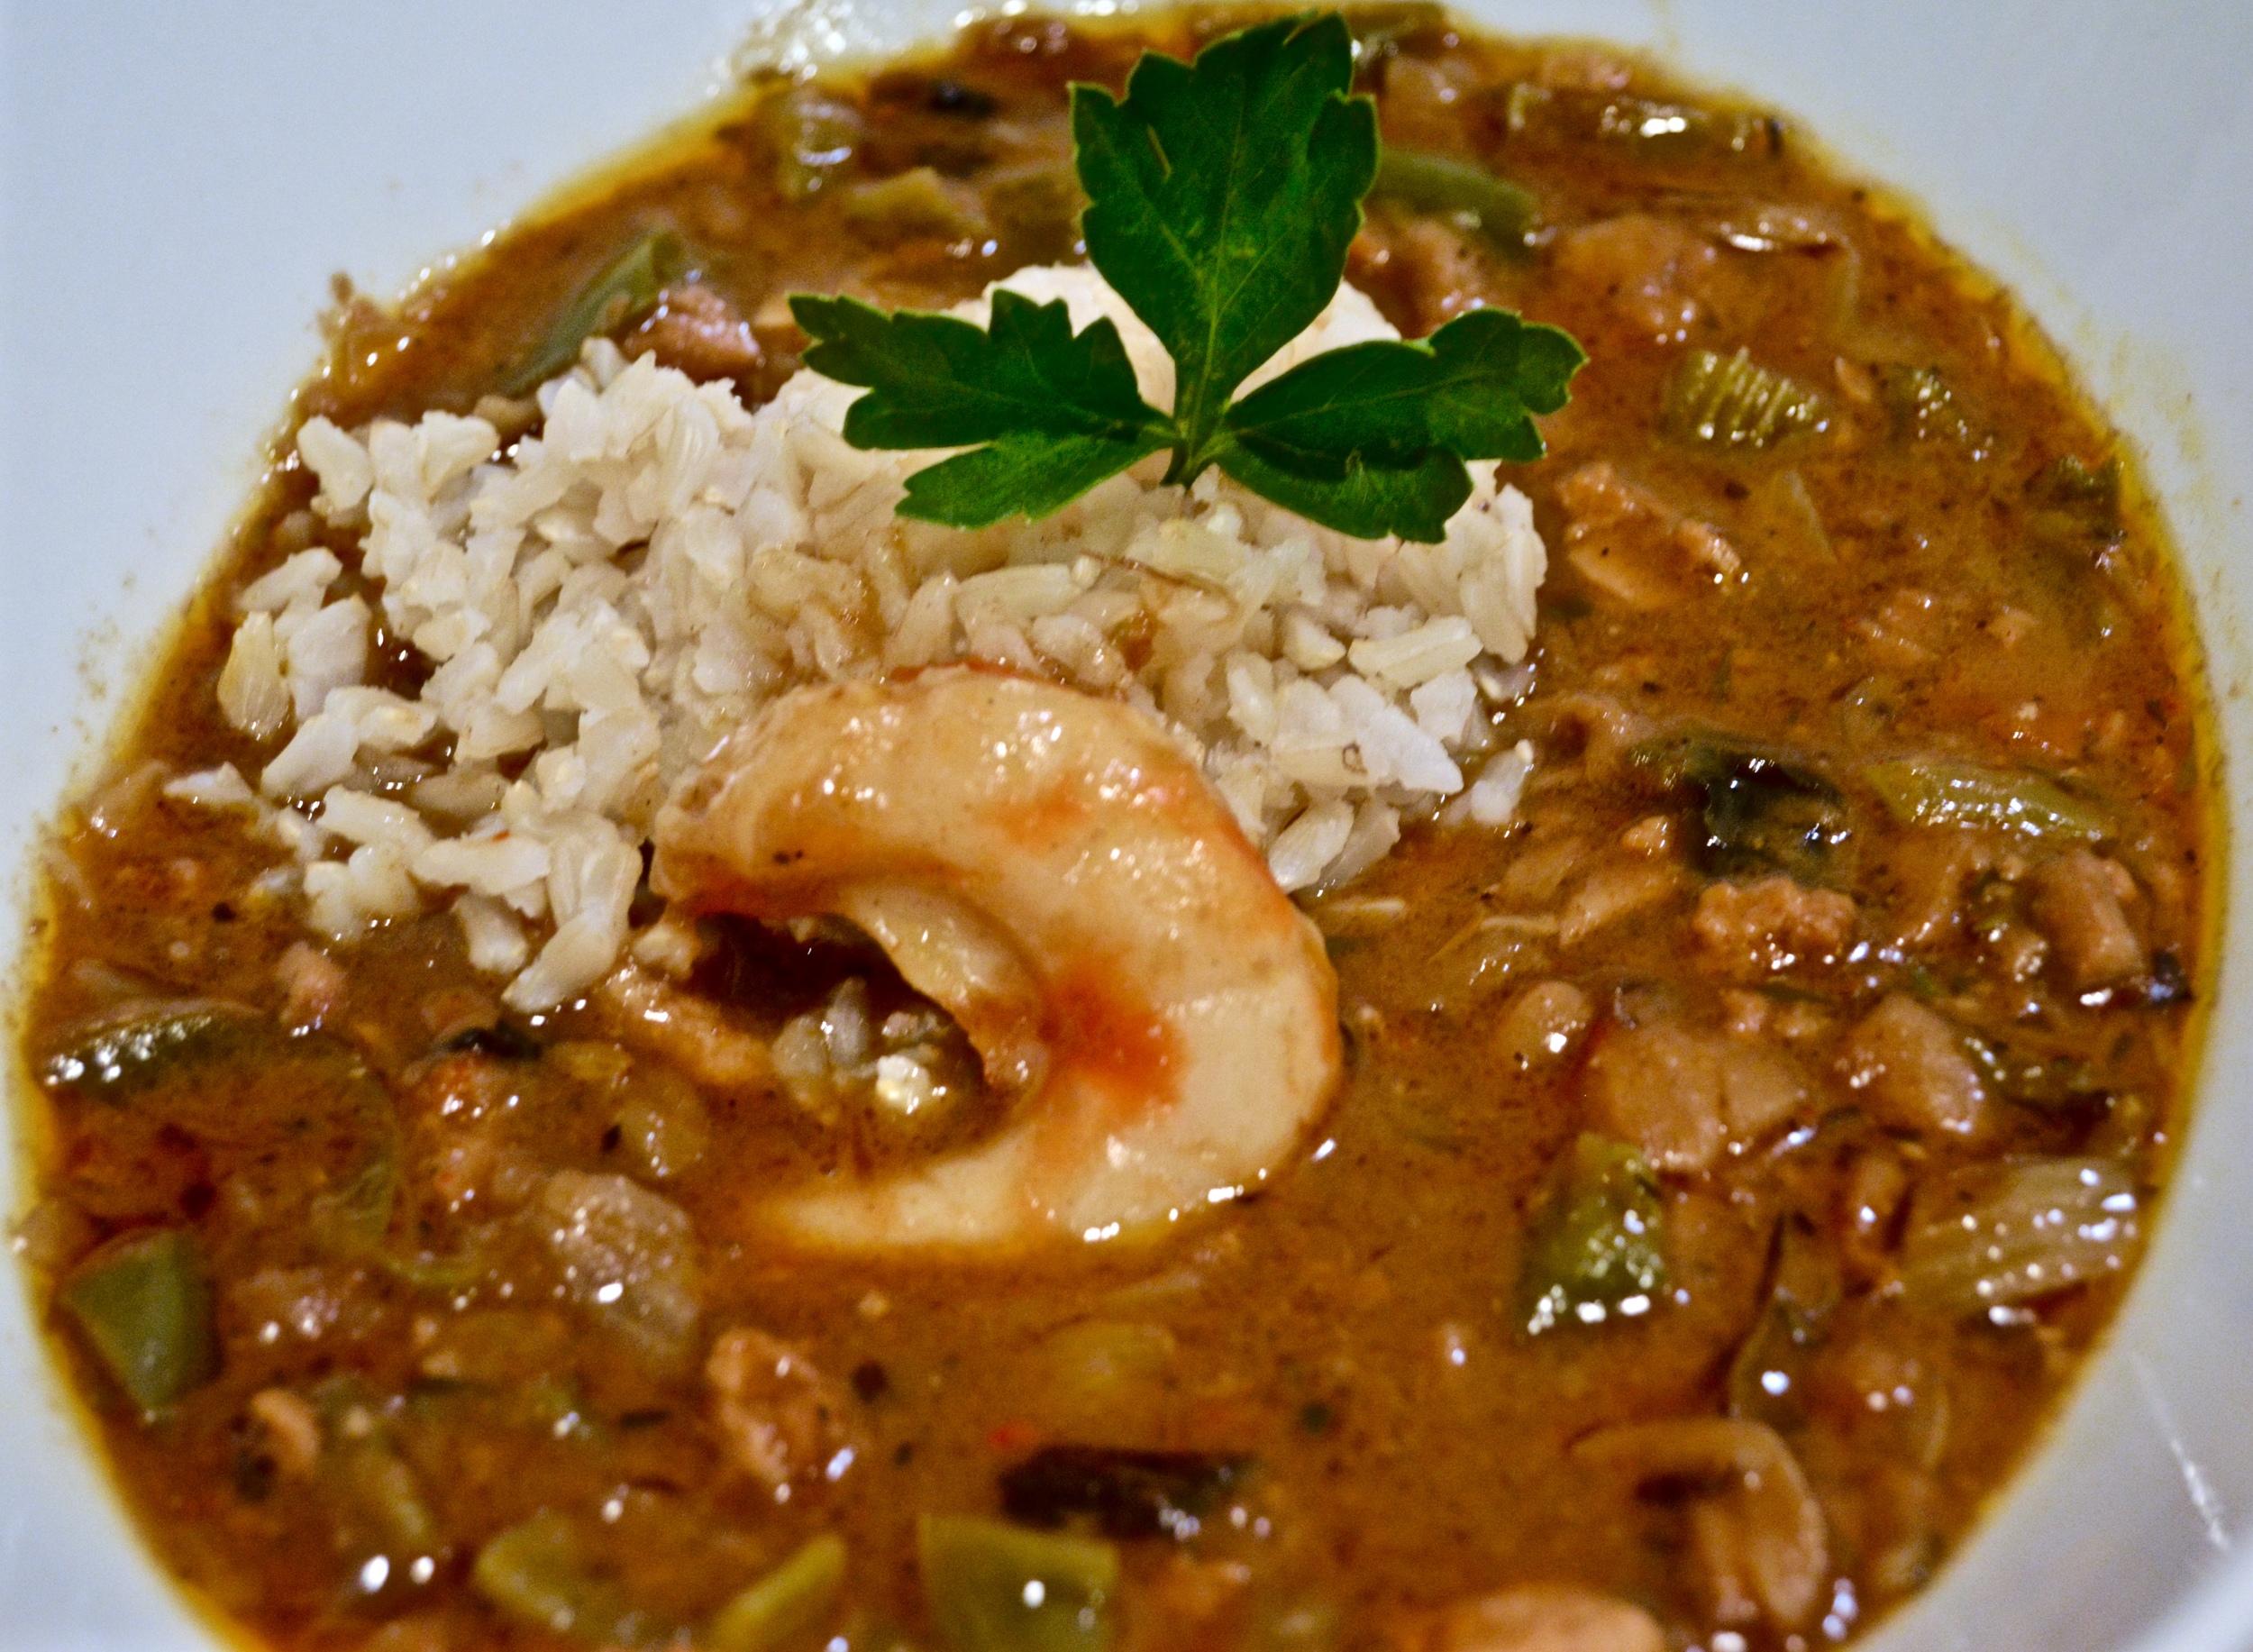 Kemba's 'Seafood' Gumbo